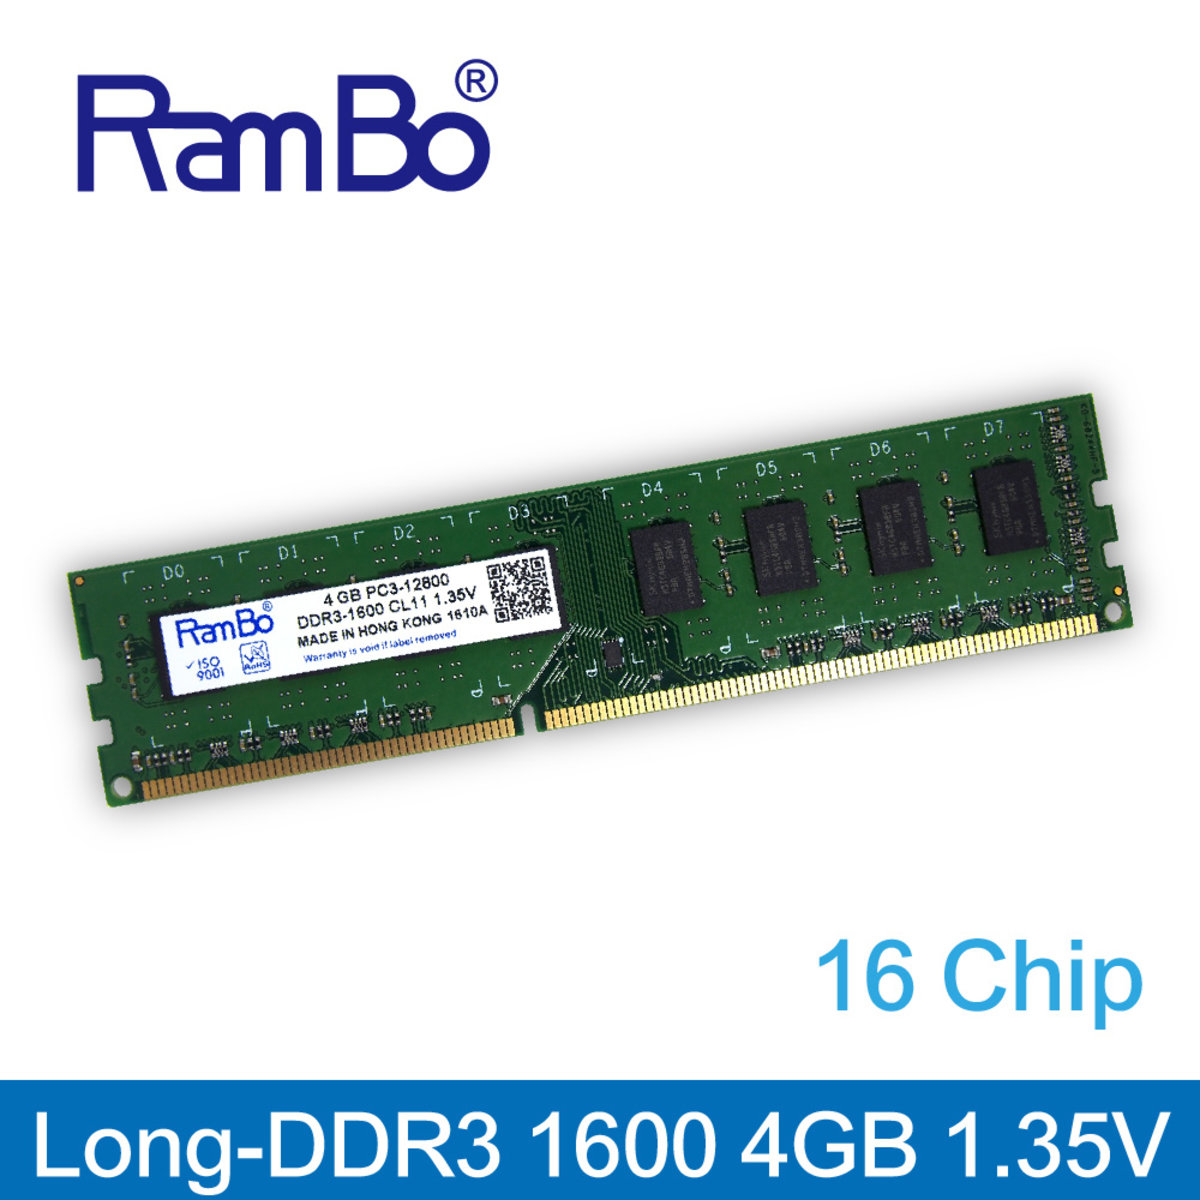 4GB DDR3 1600MHz Long DIMM 16-Chip(雙面) 1.35V 記憶體 內存條 台式電腦適用 PC